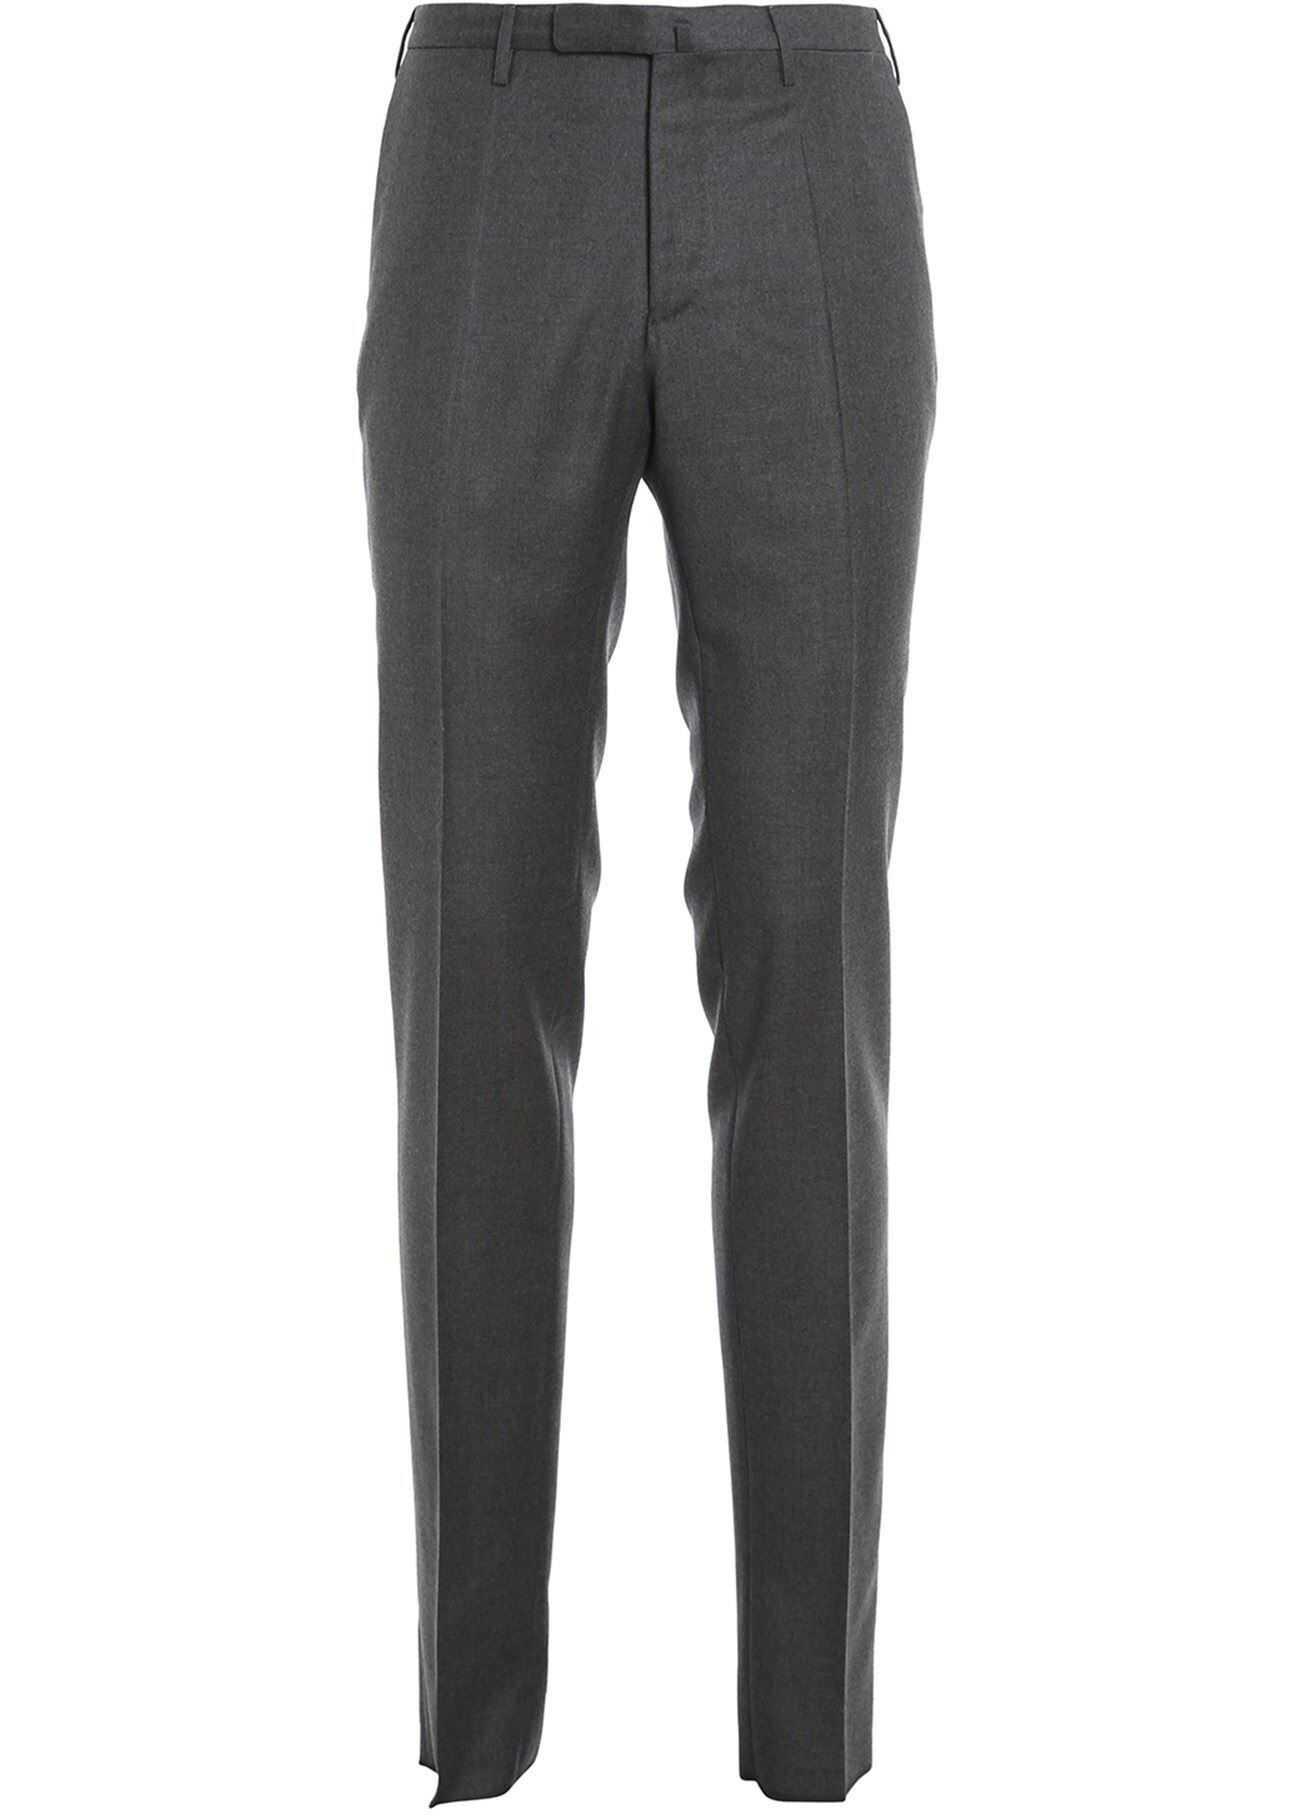 Incotex Virgin Wood Trousers In Grey Grey imagine